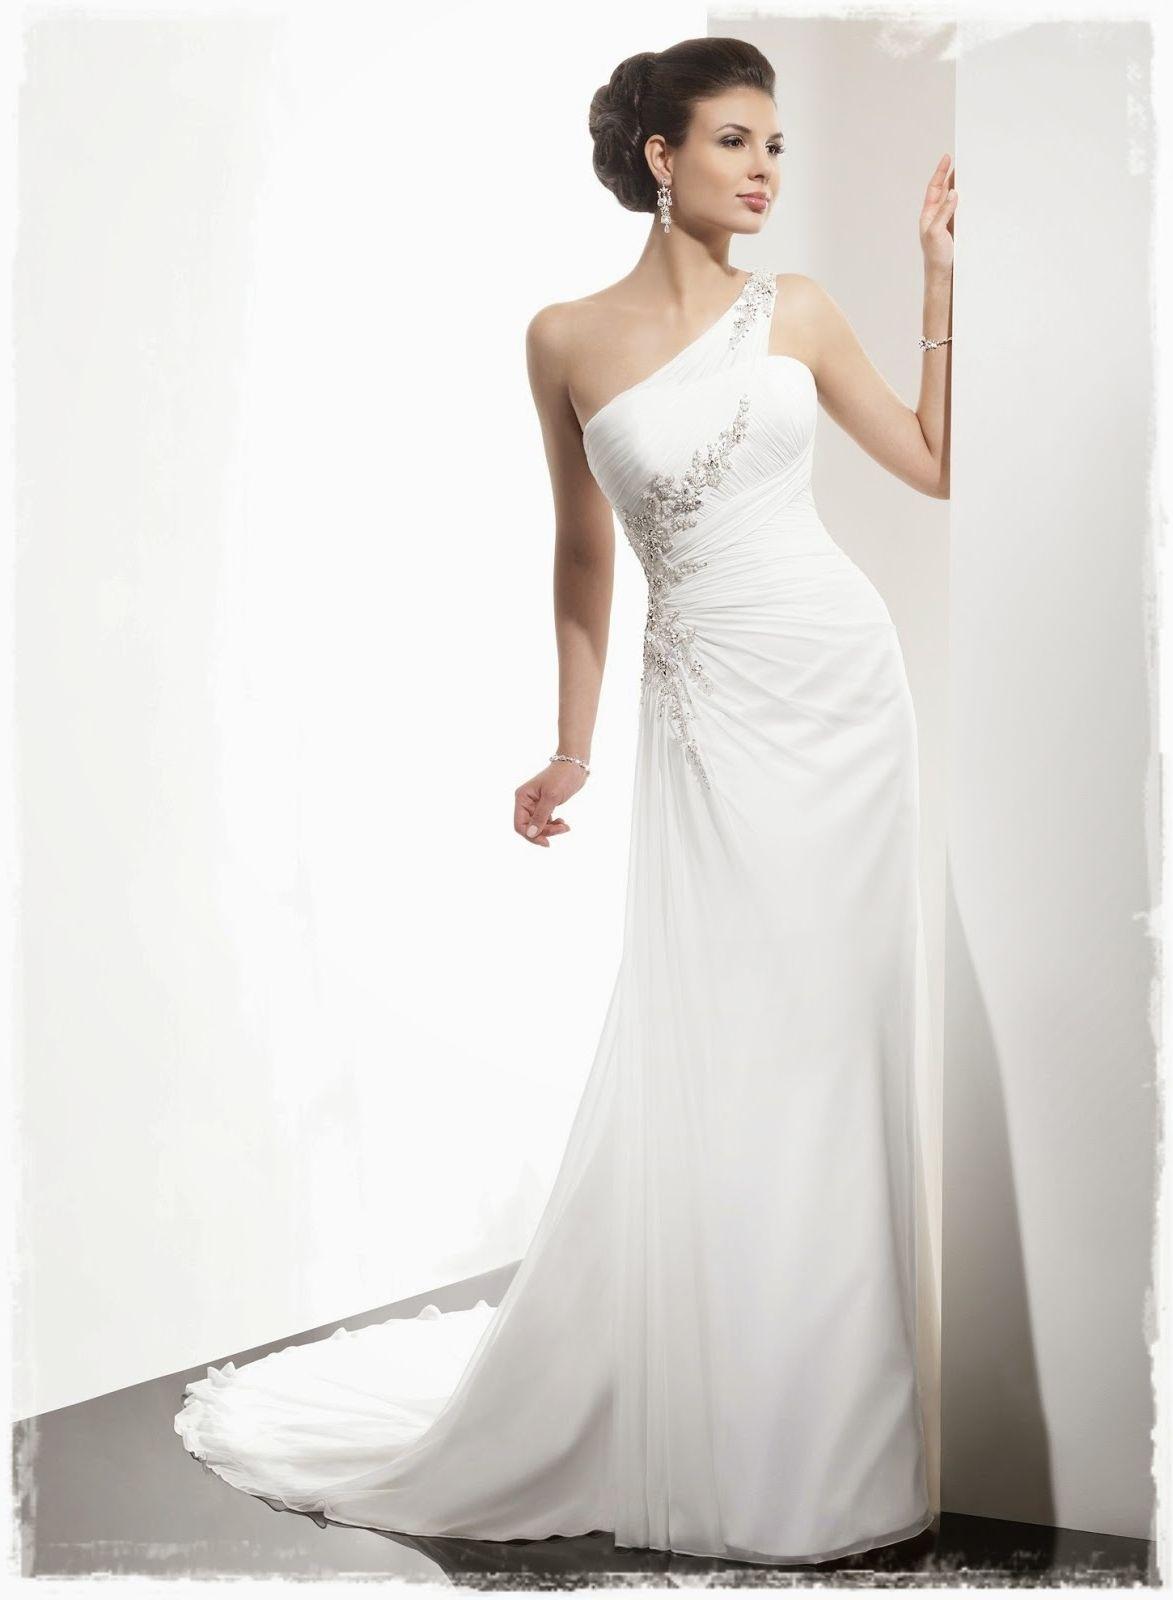 Best Wedding Dress Silhouette For Broad Shoulders | Wedding Dress ...